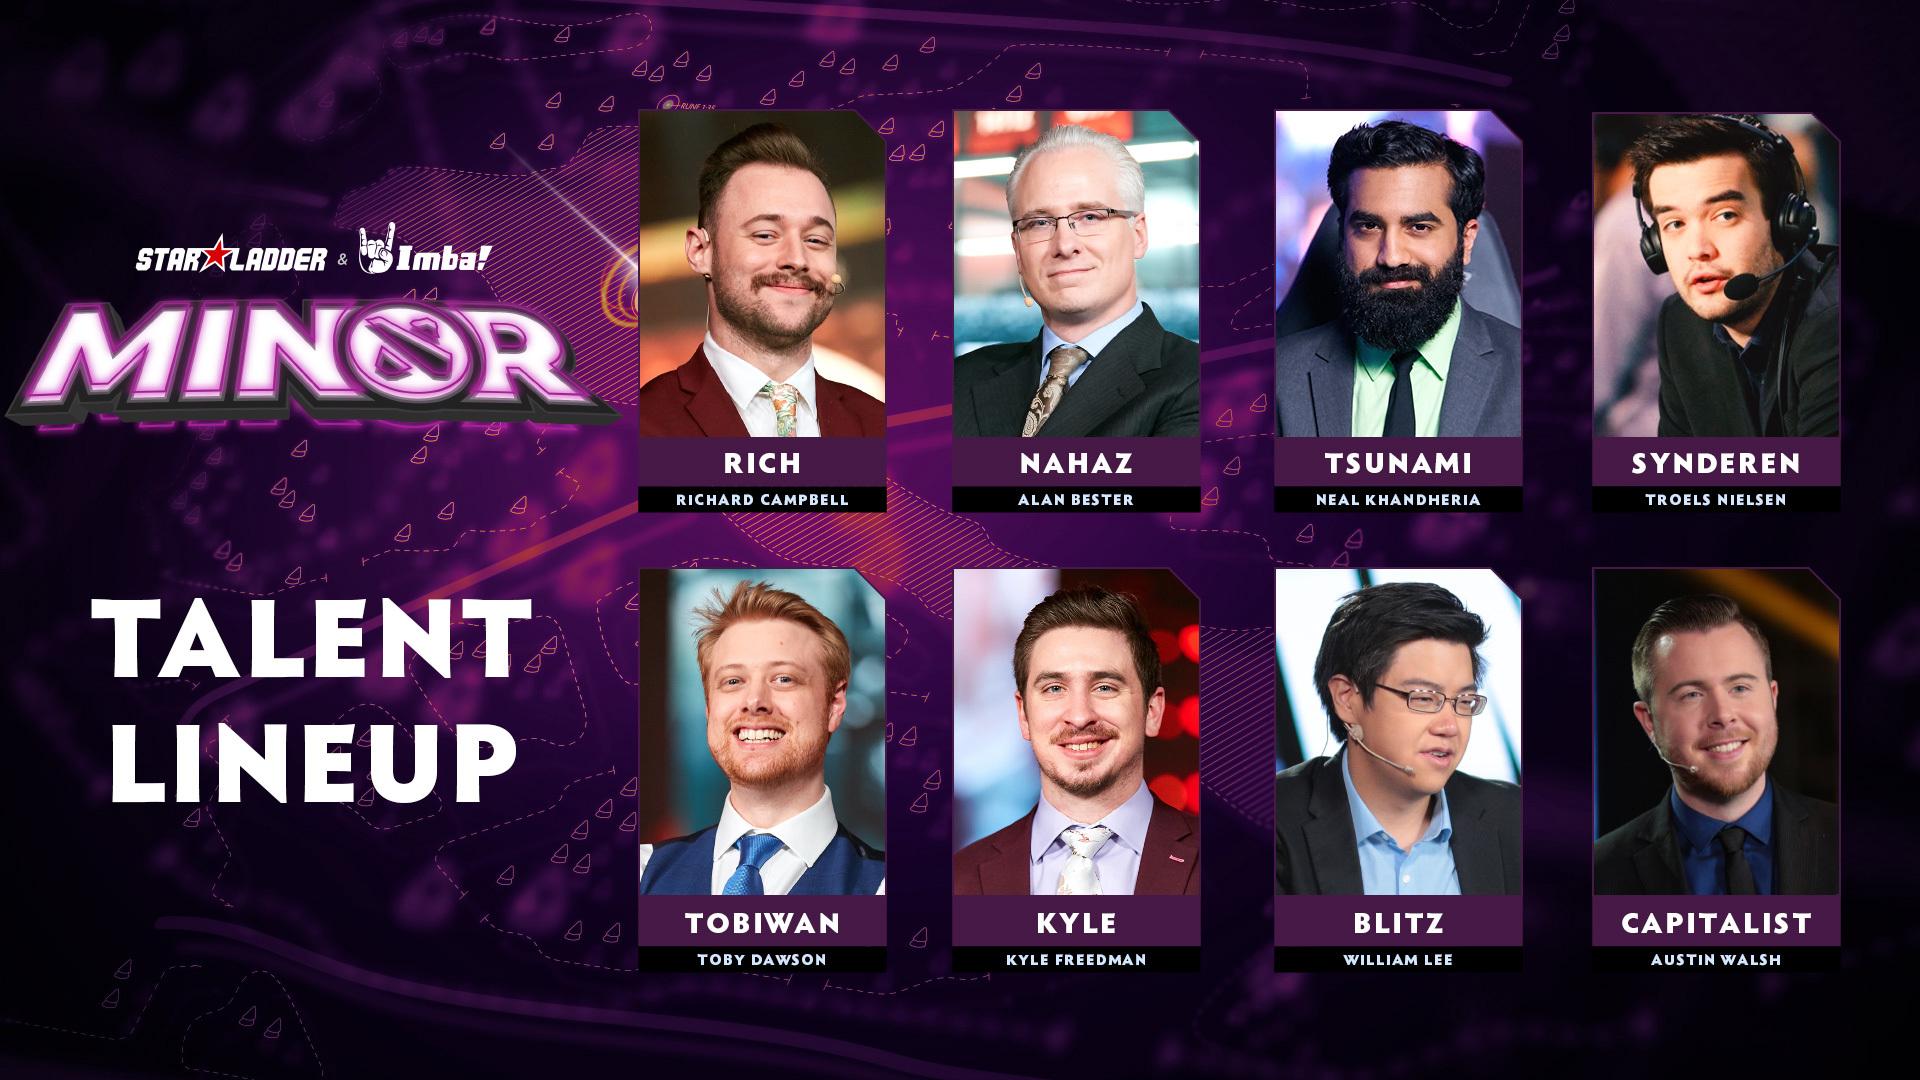 Welcome the talent lineup for StarLadder ImbaTV Dota 2 Minor!